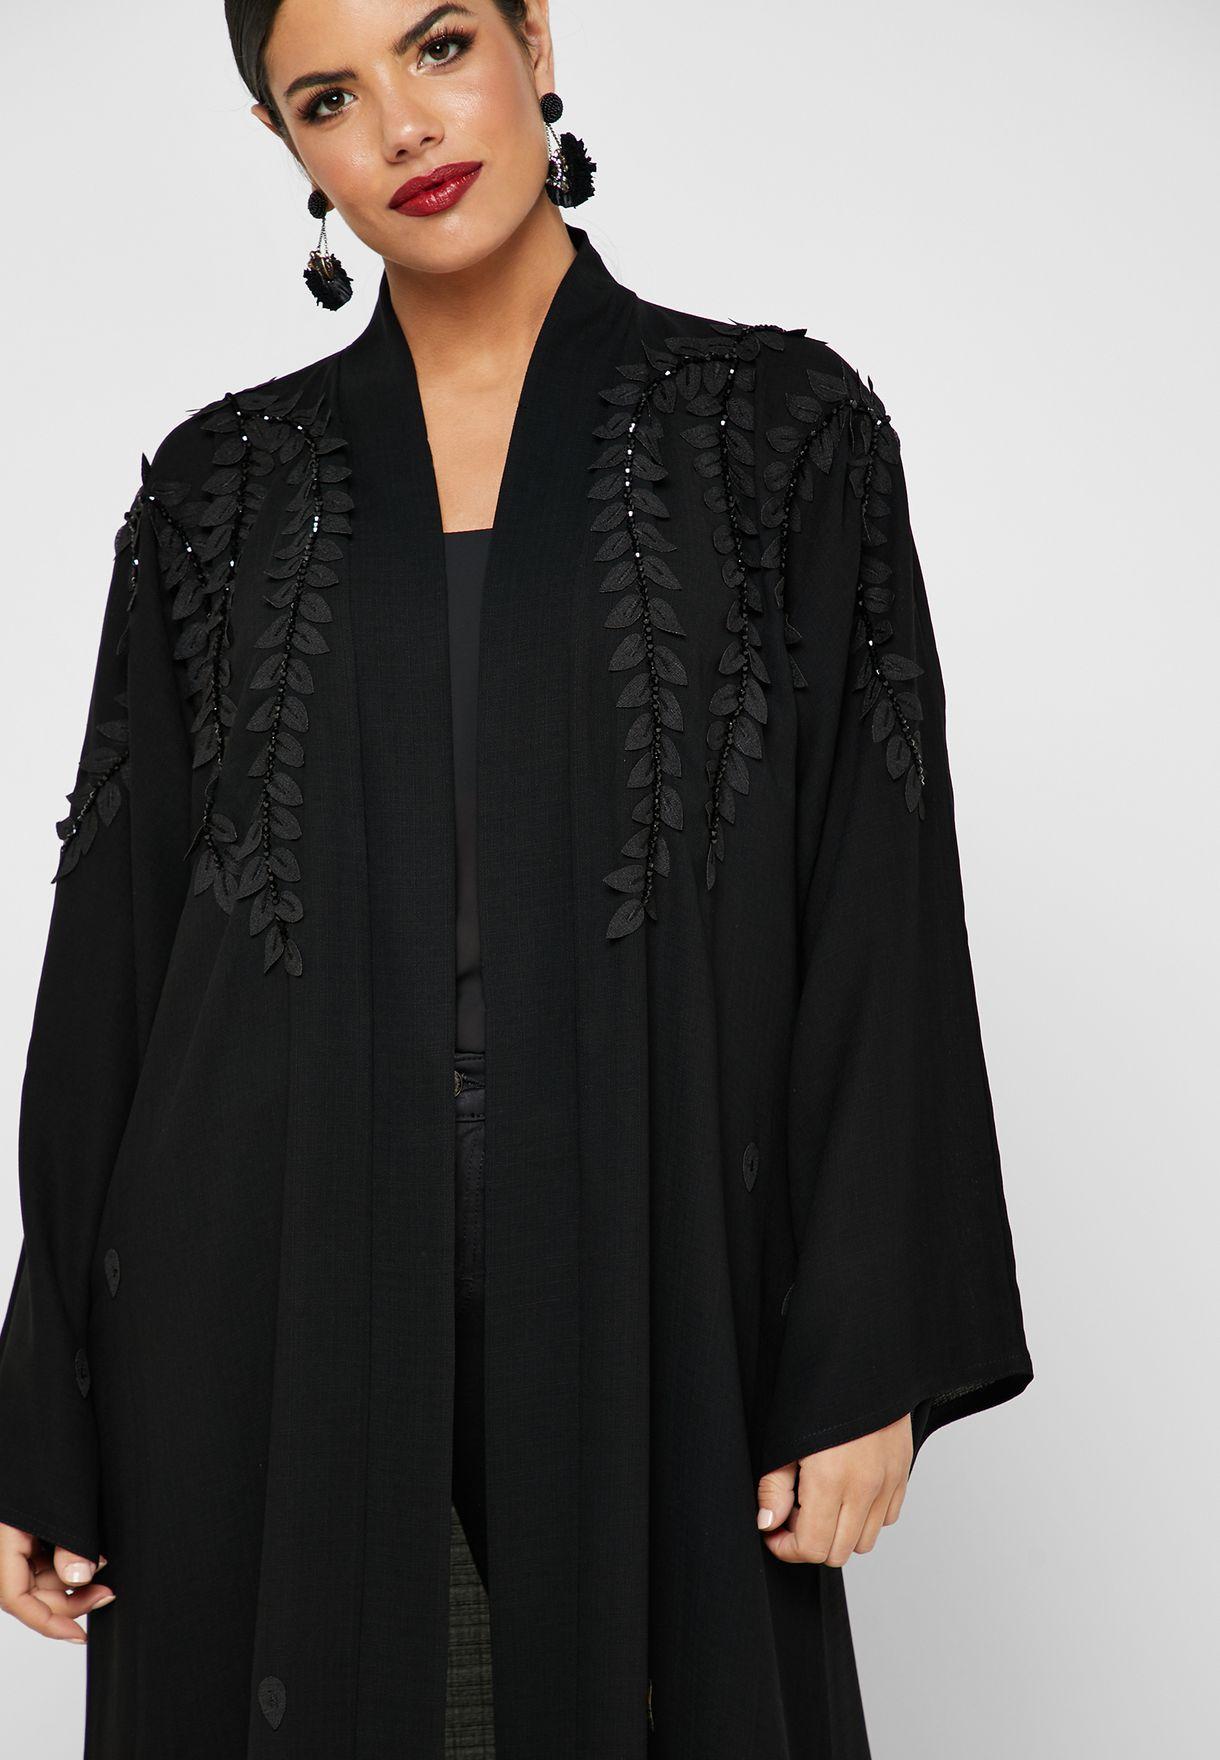 Leaf Applique Beaded Abaya